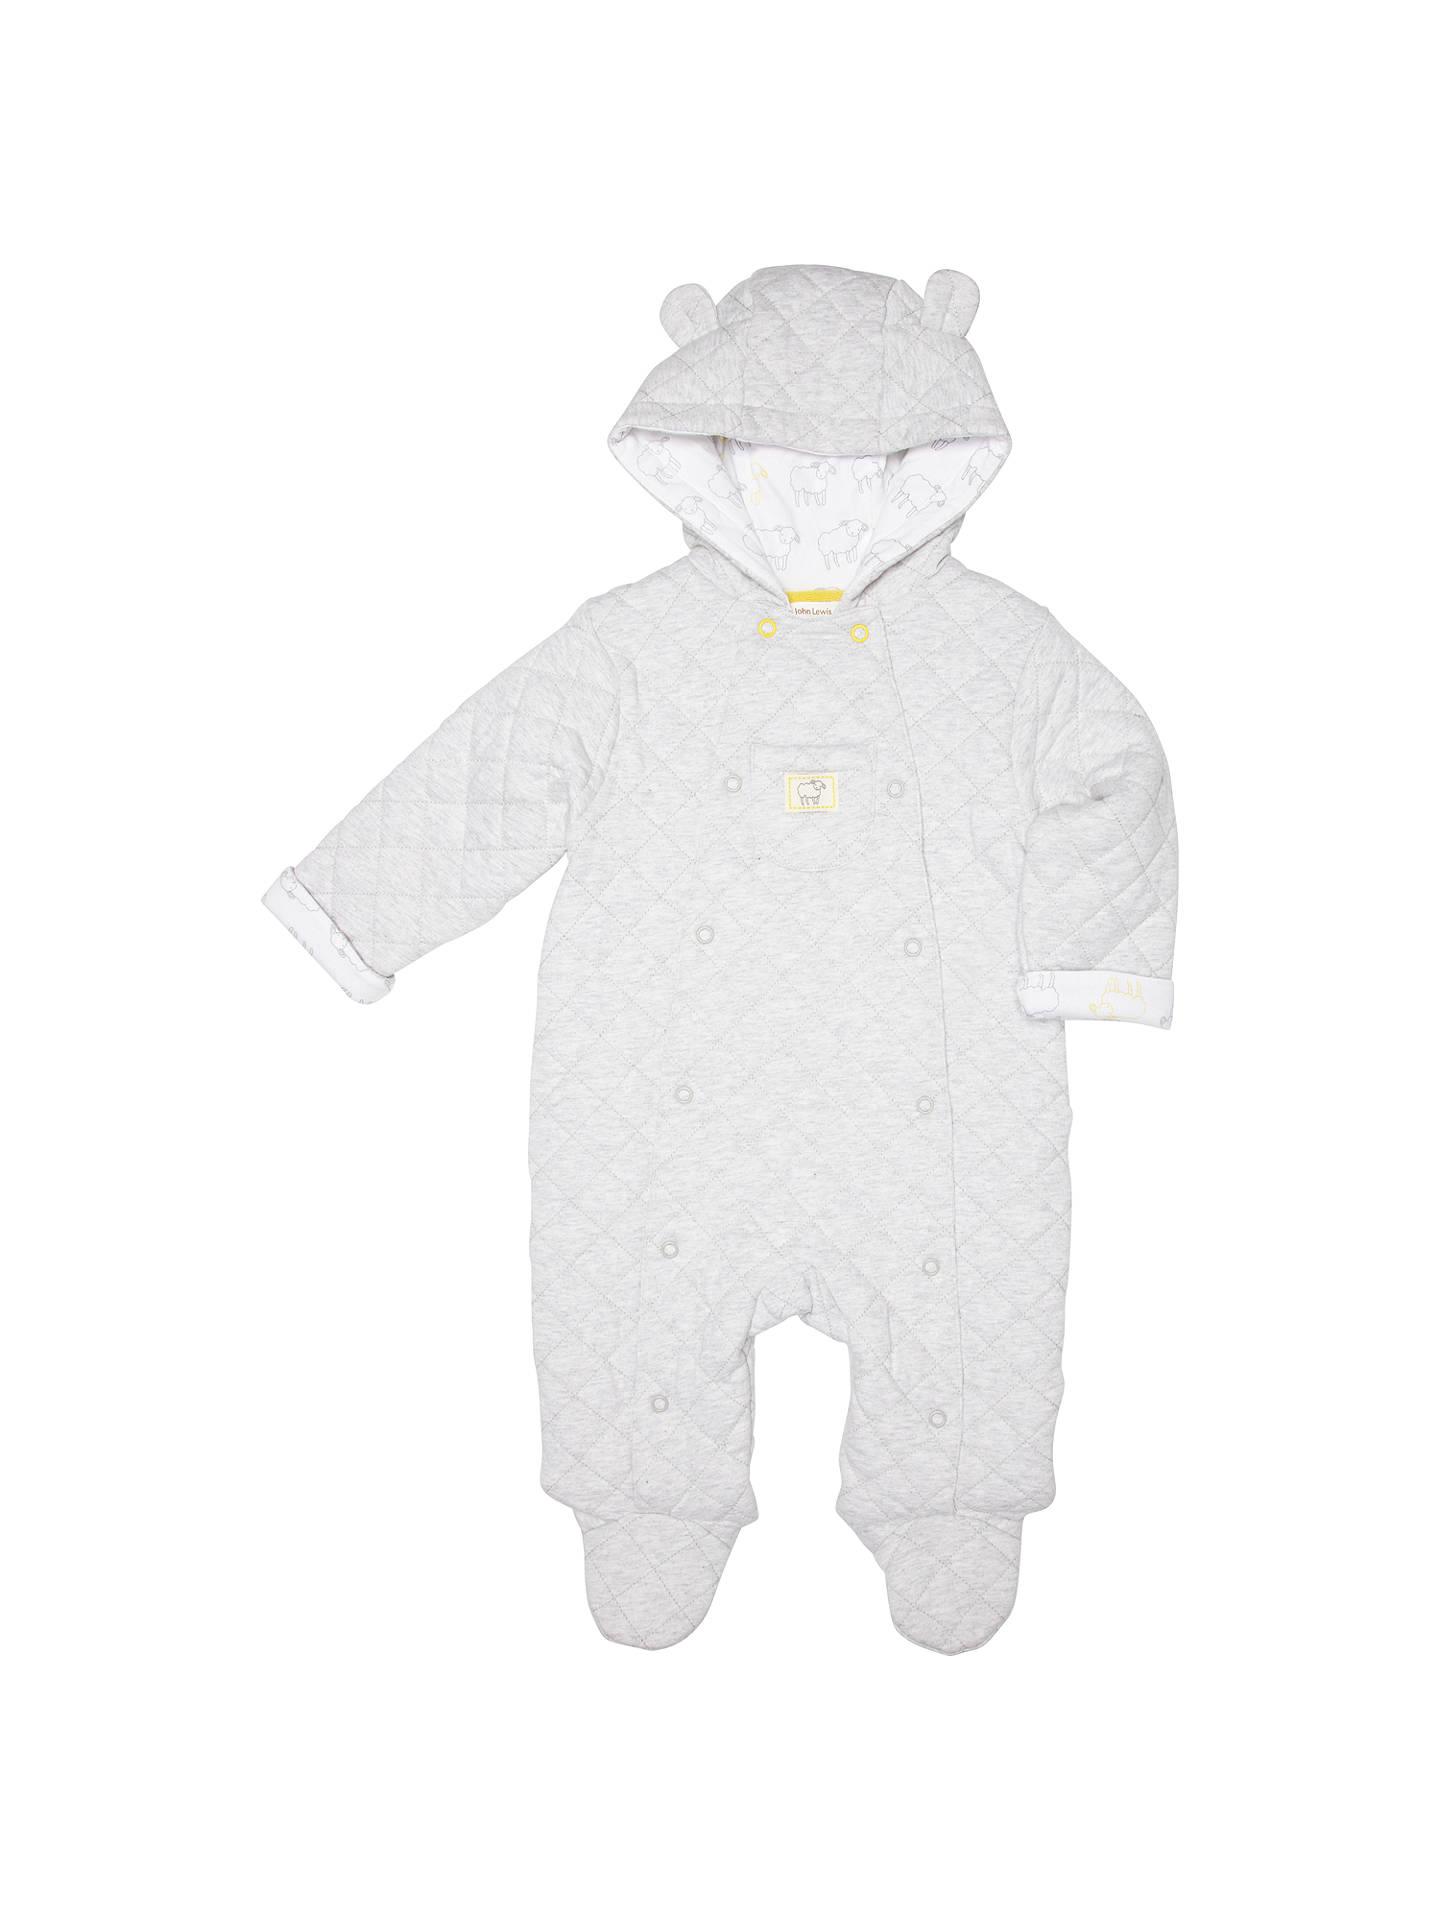 dcd5e7350e7c John Lewis Quilted Marl Knit Babysuit